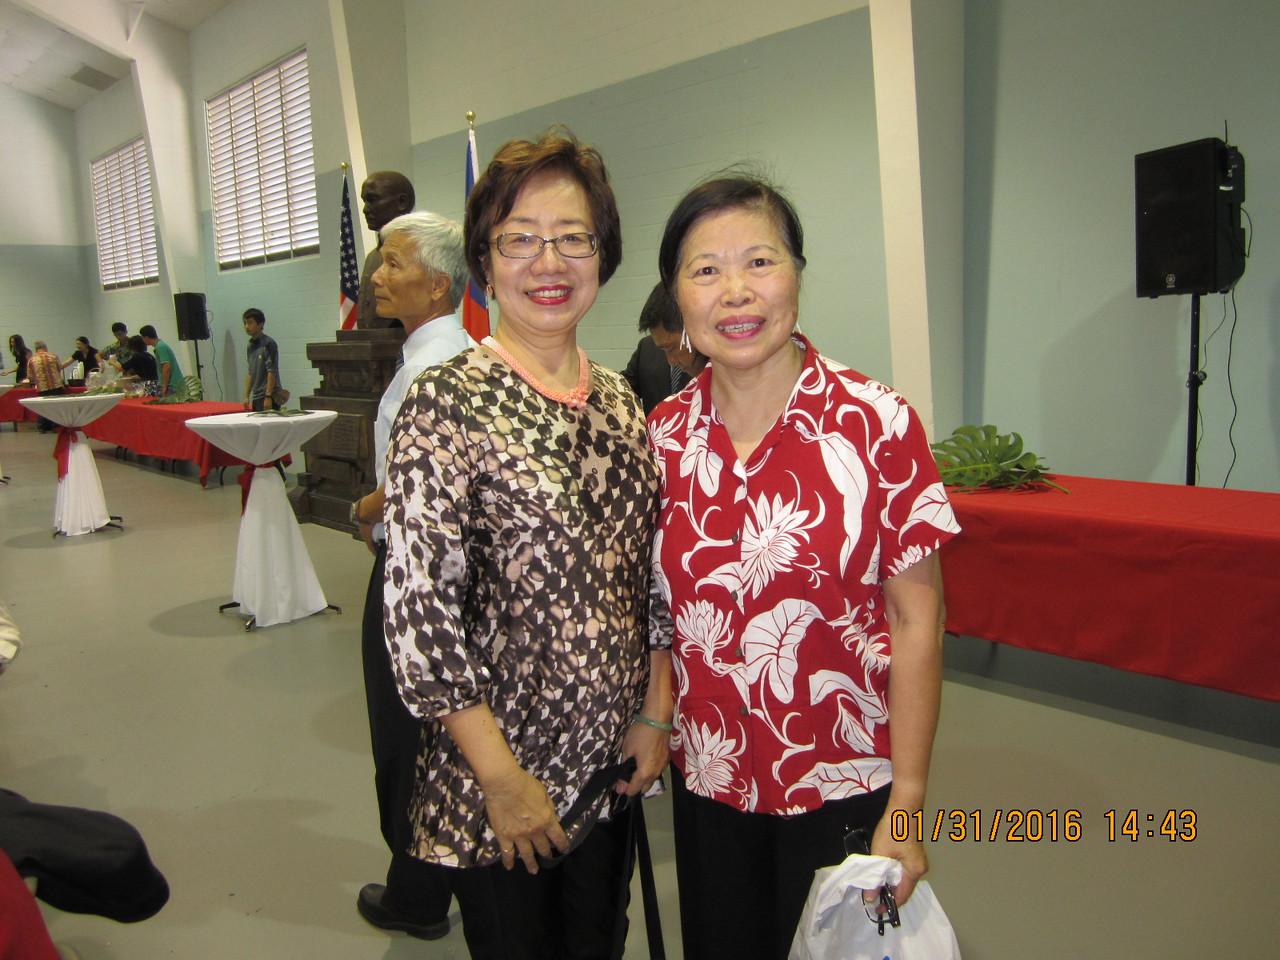 Flora with her friend Sue